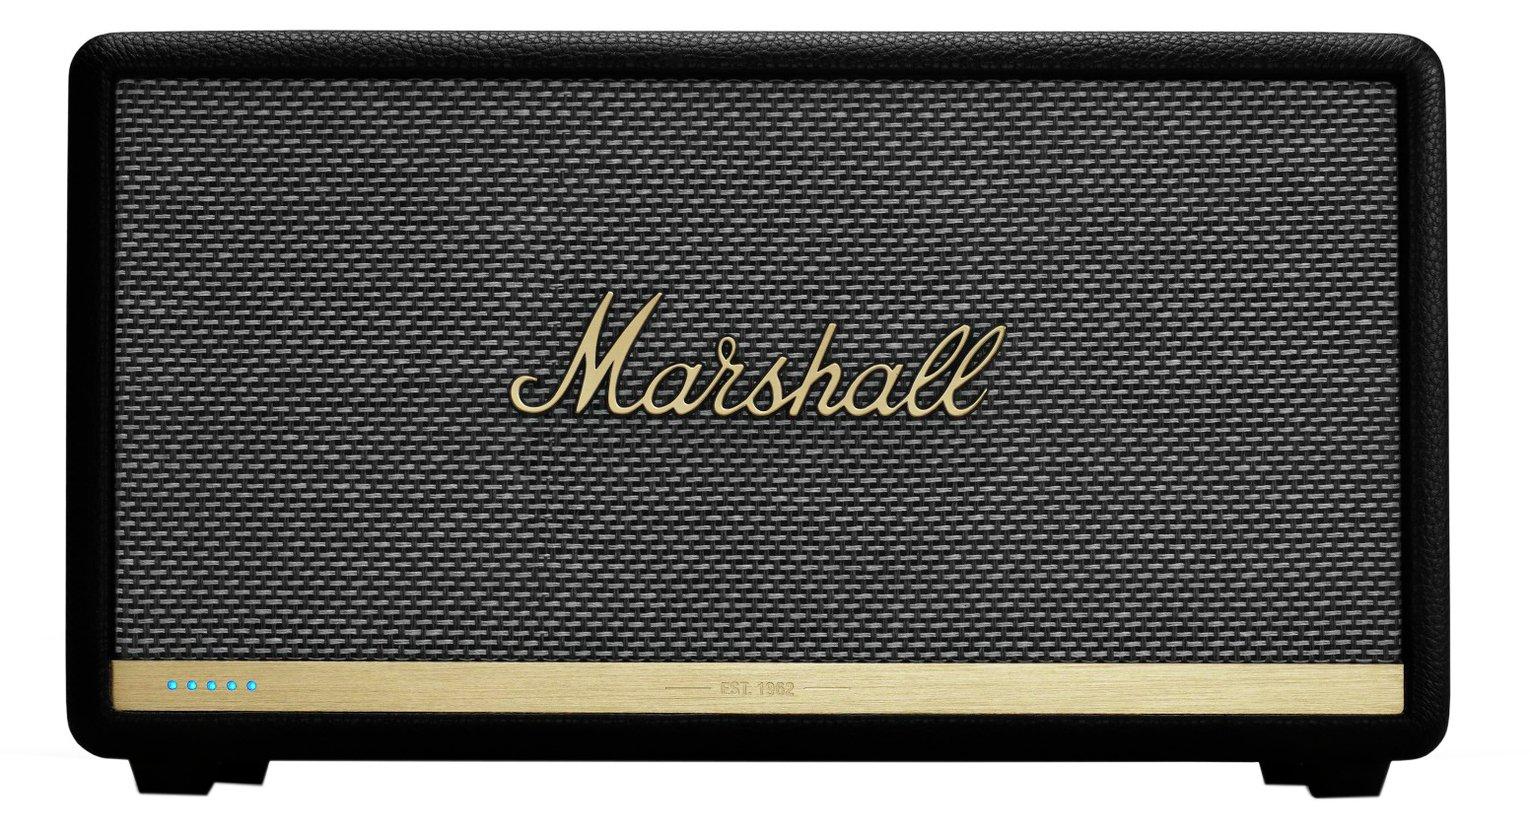 Marshall Stanmore II Voice Wireless Speaker with Alexa